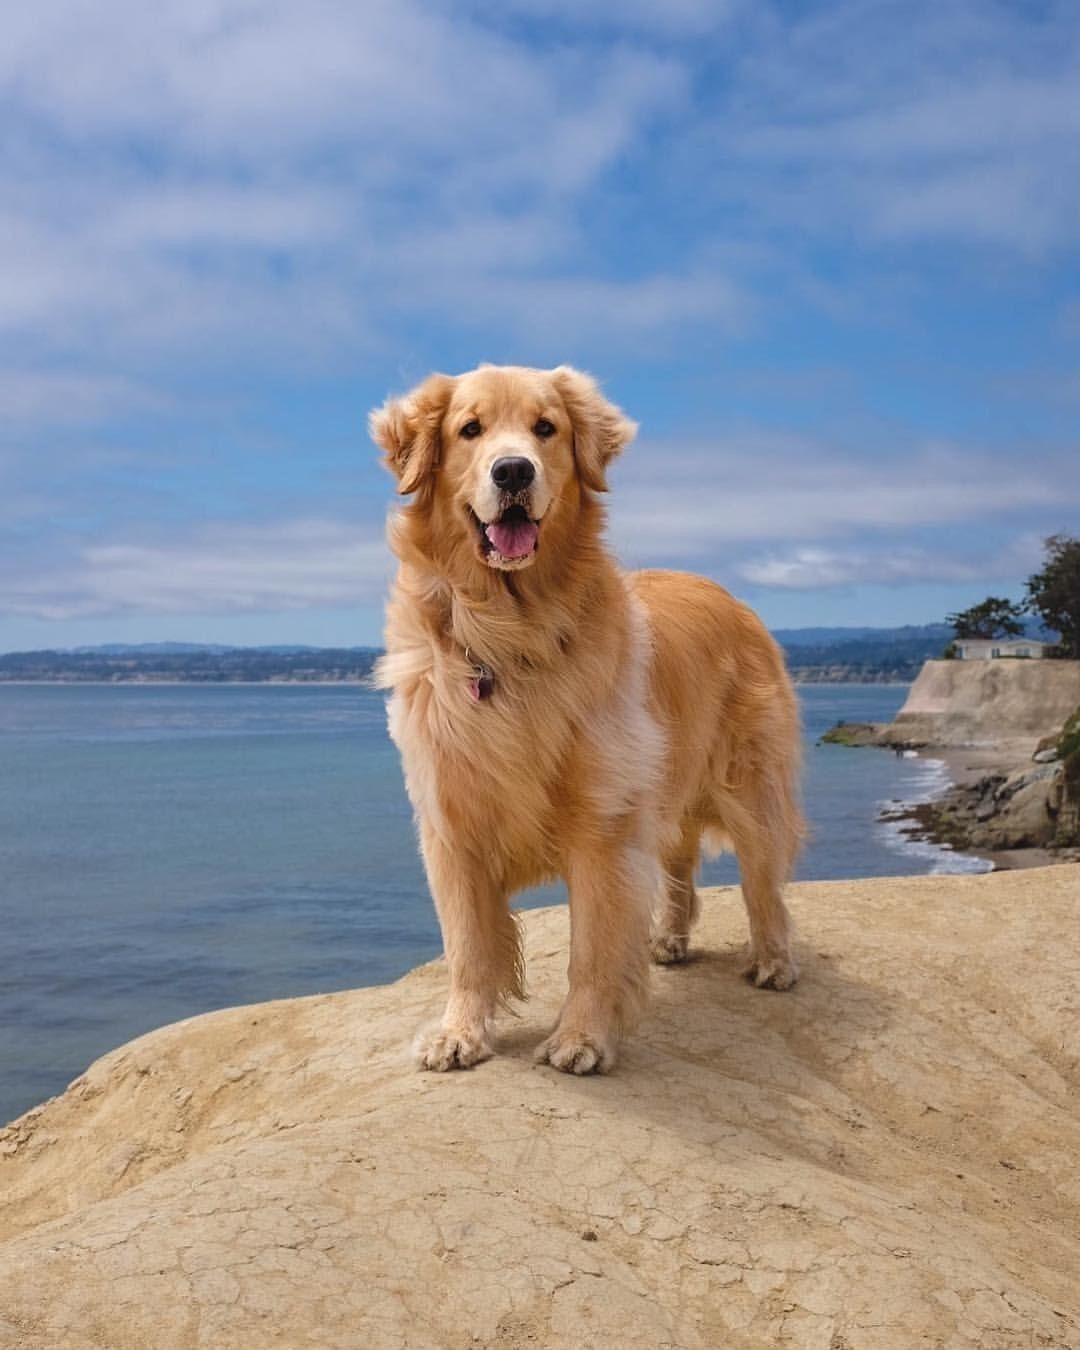 Sweet Goldenretriever Am Meer Hund Hunde Buddyandbello Buddybello Urlaubmithund Cute Dog Mit Bildern Hunde Hunderassen Hundebilder